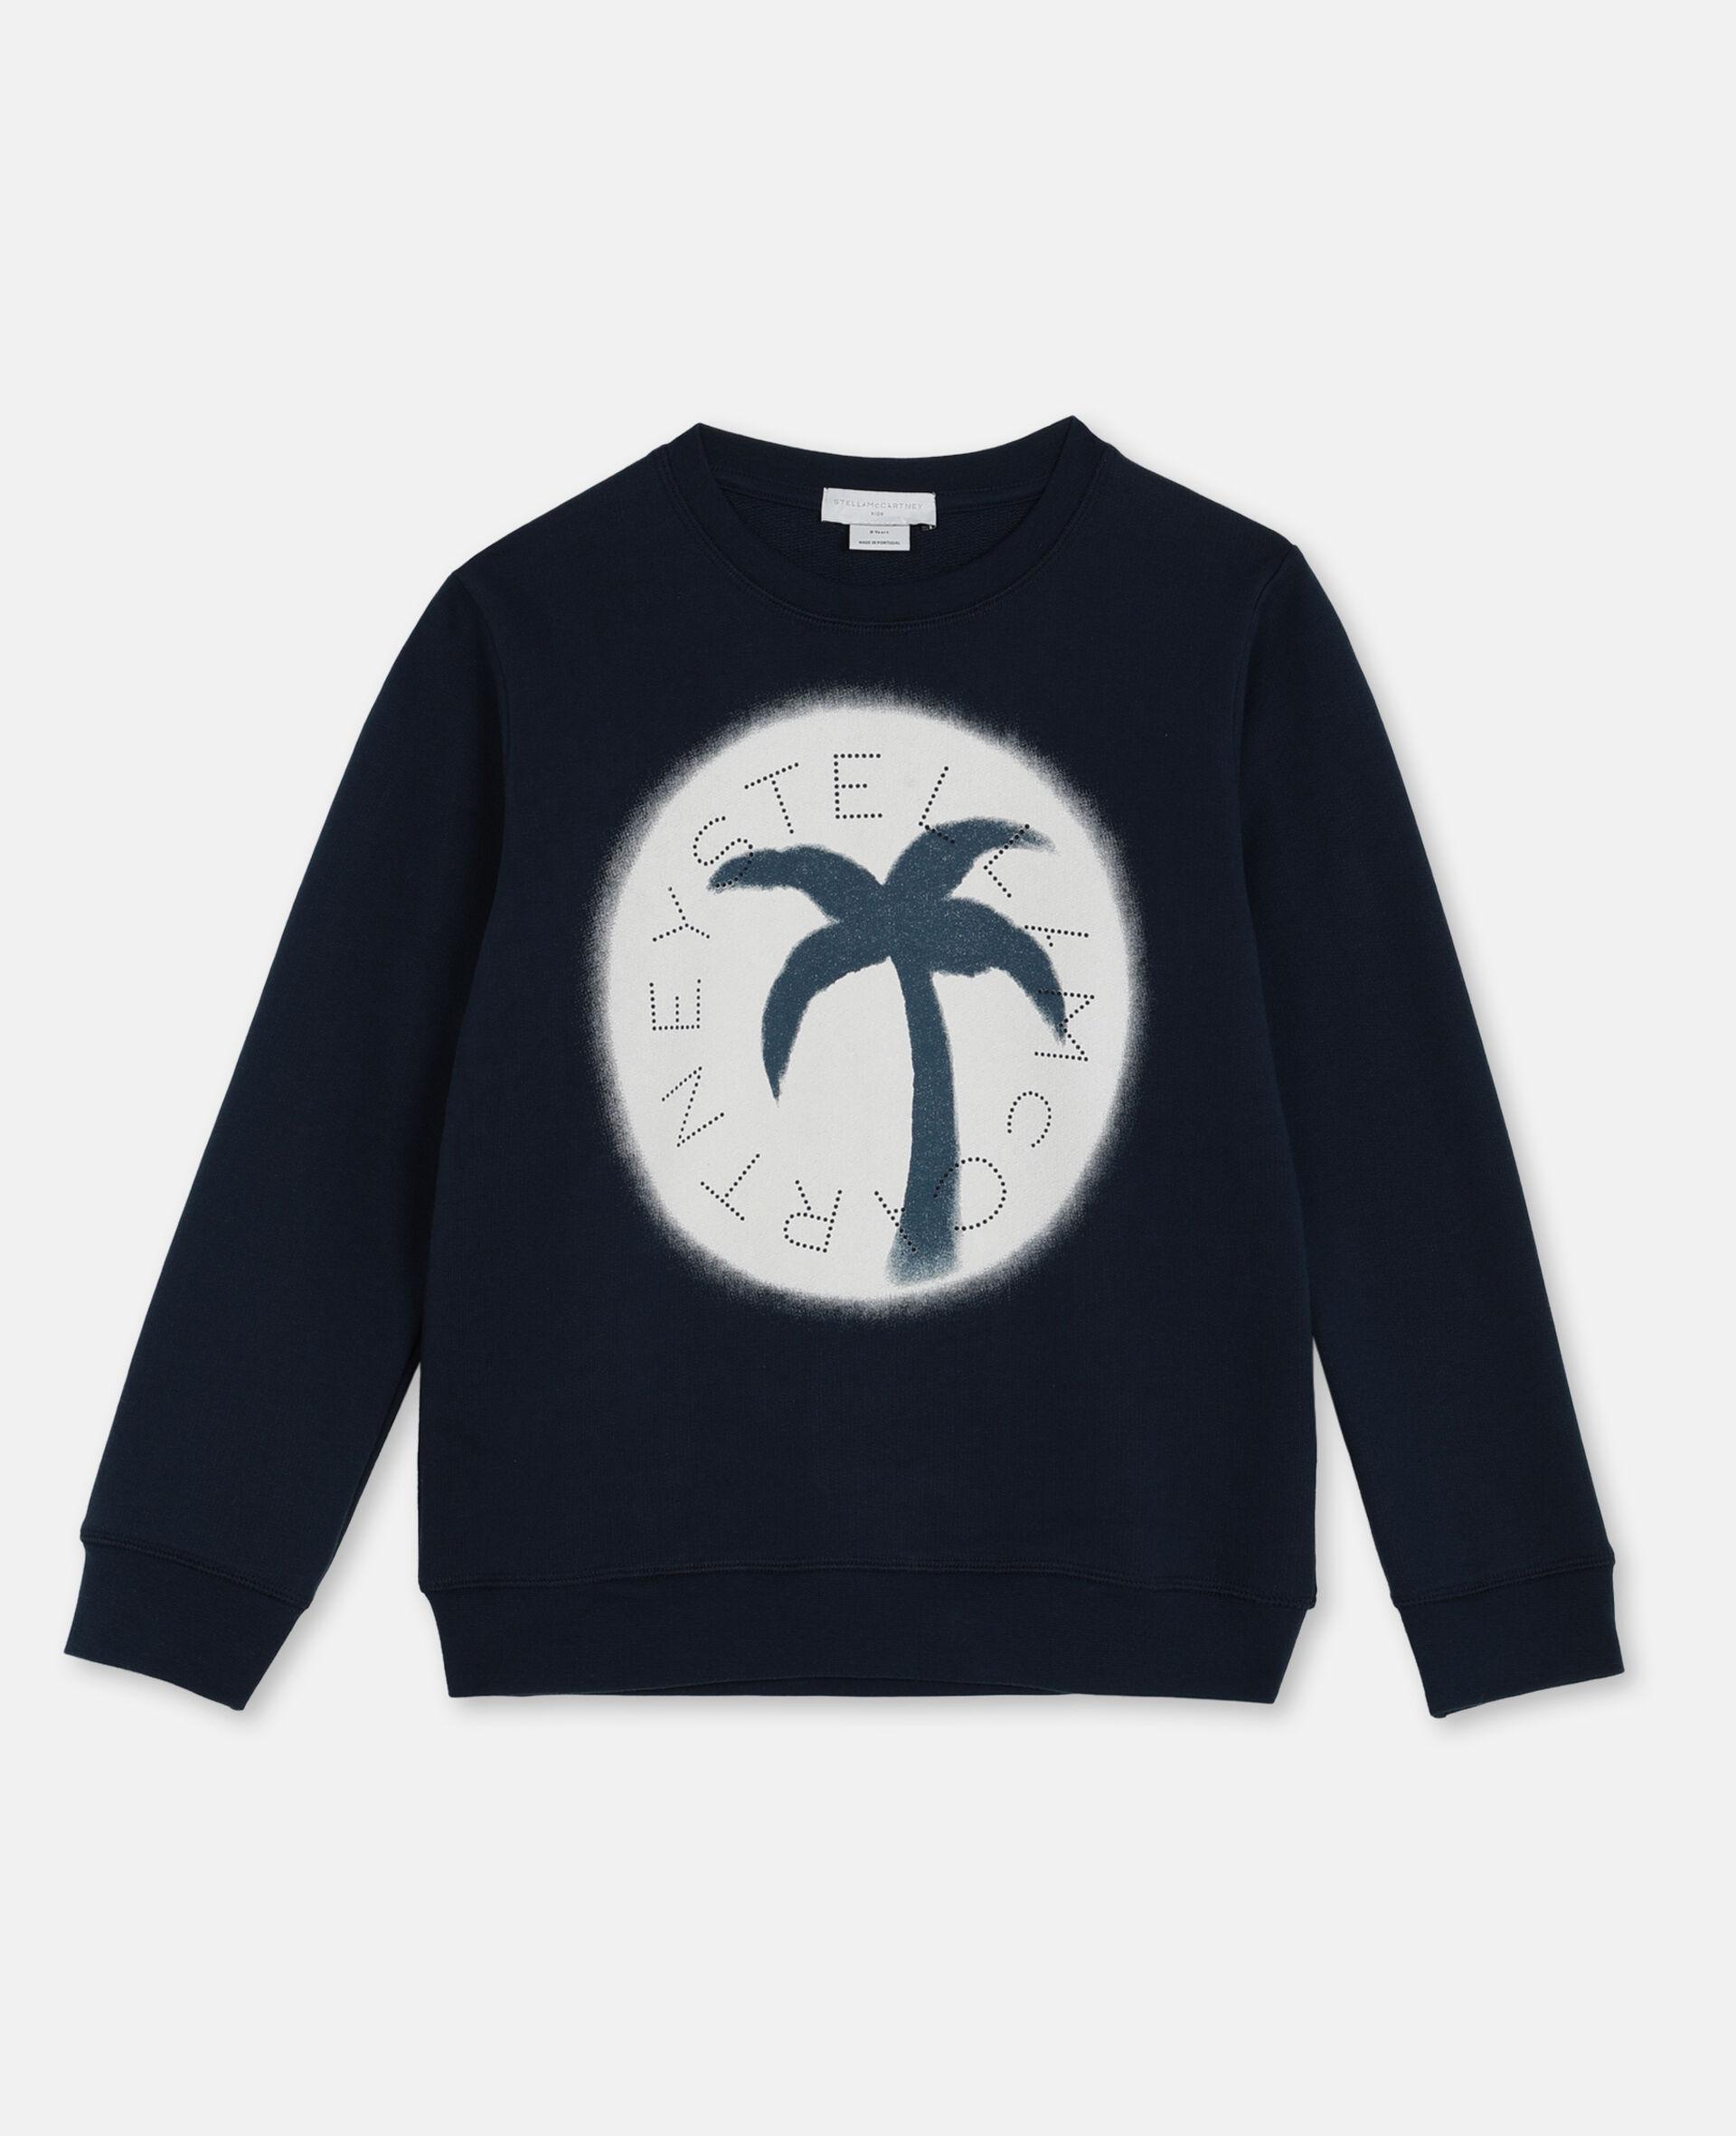 Oversized-Sweathshirt aus Baumwollfleece mit Logo-Blau-large image number 0